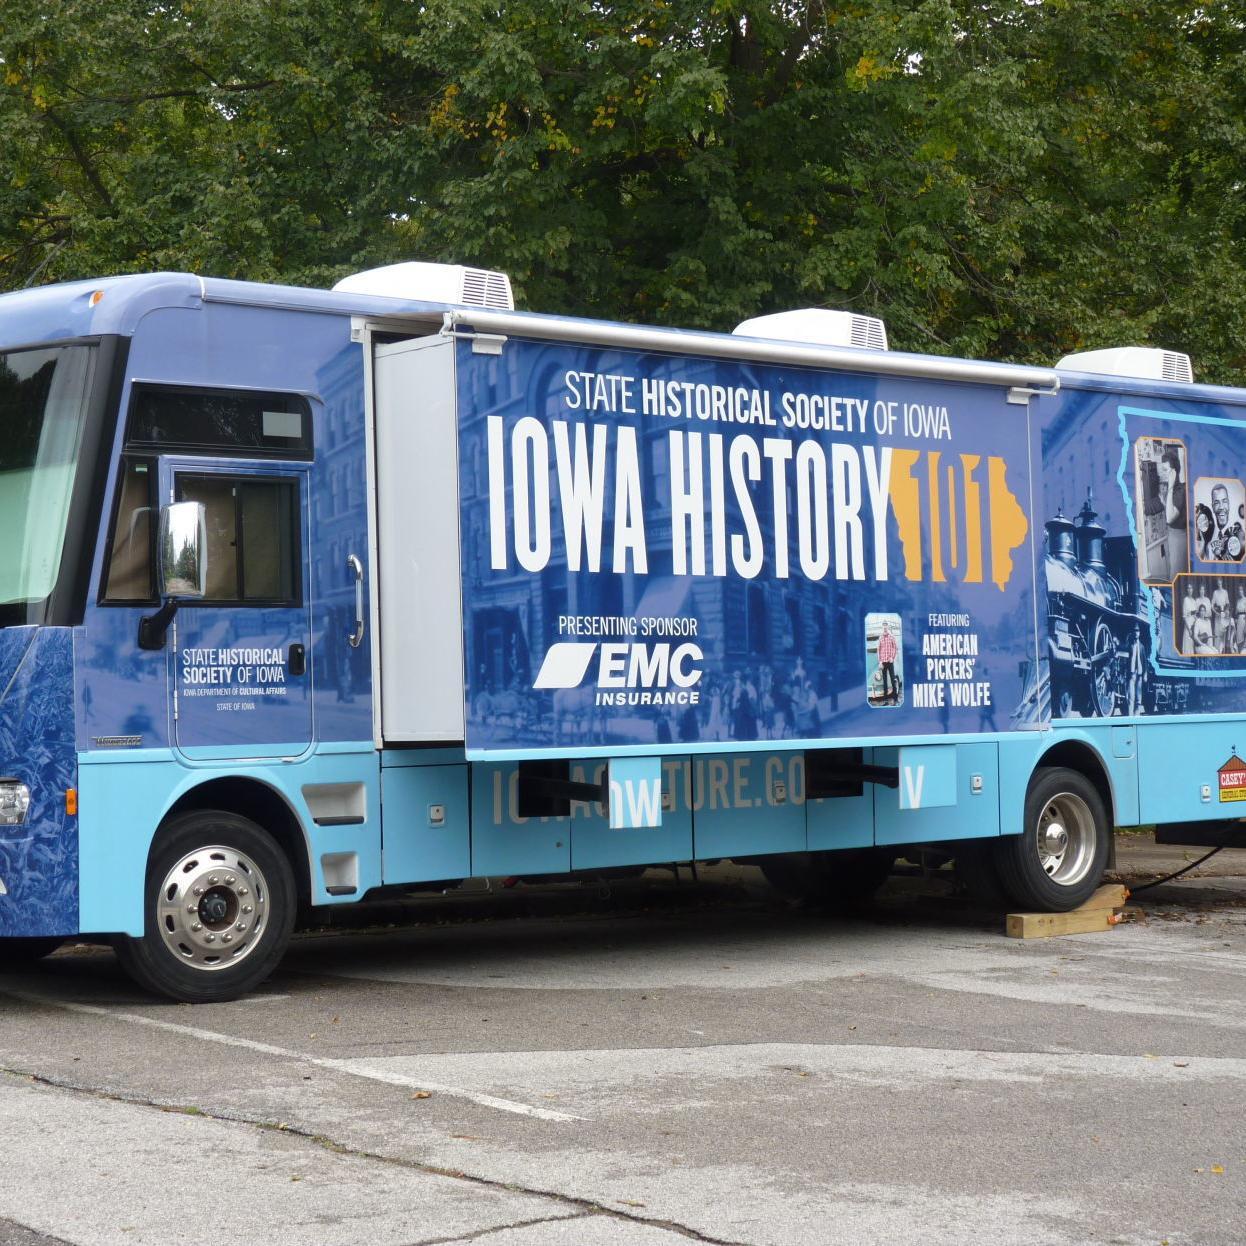 Iowa History 101 Bus Visits Muscatine Through Sunday Local